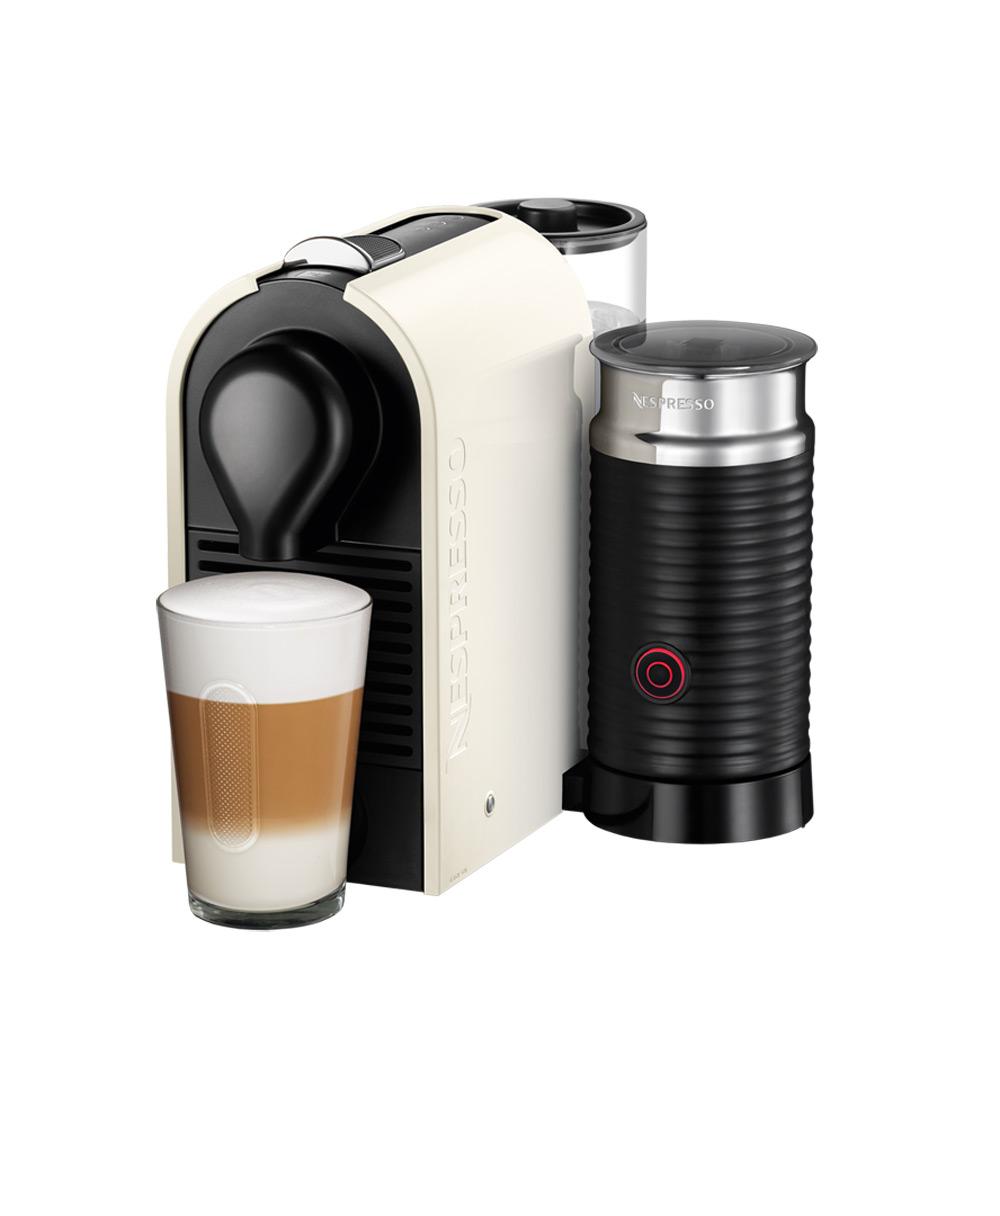 Umilk Nespresso Machine - All U Need is Milk - eXtravaganzi